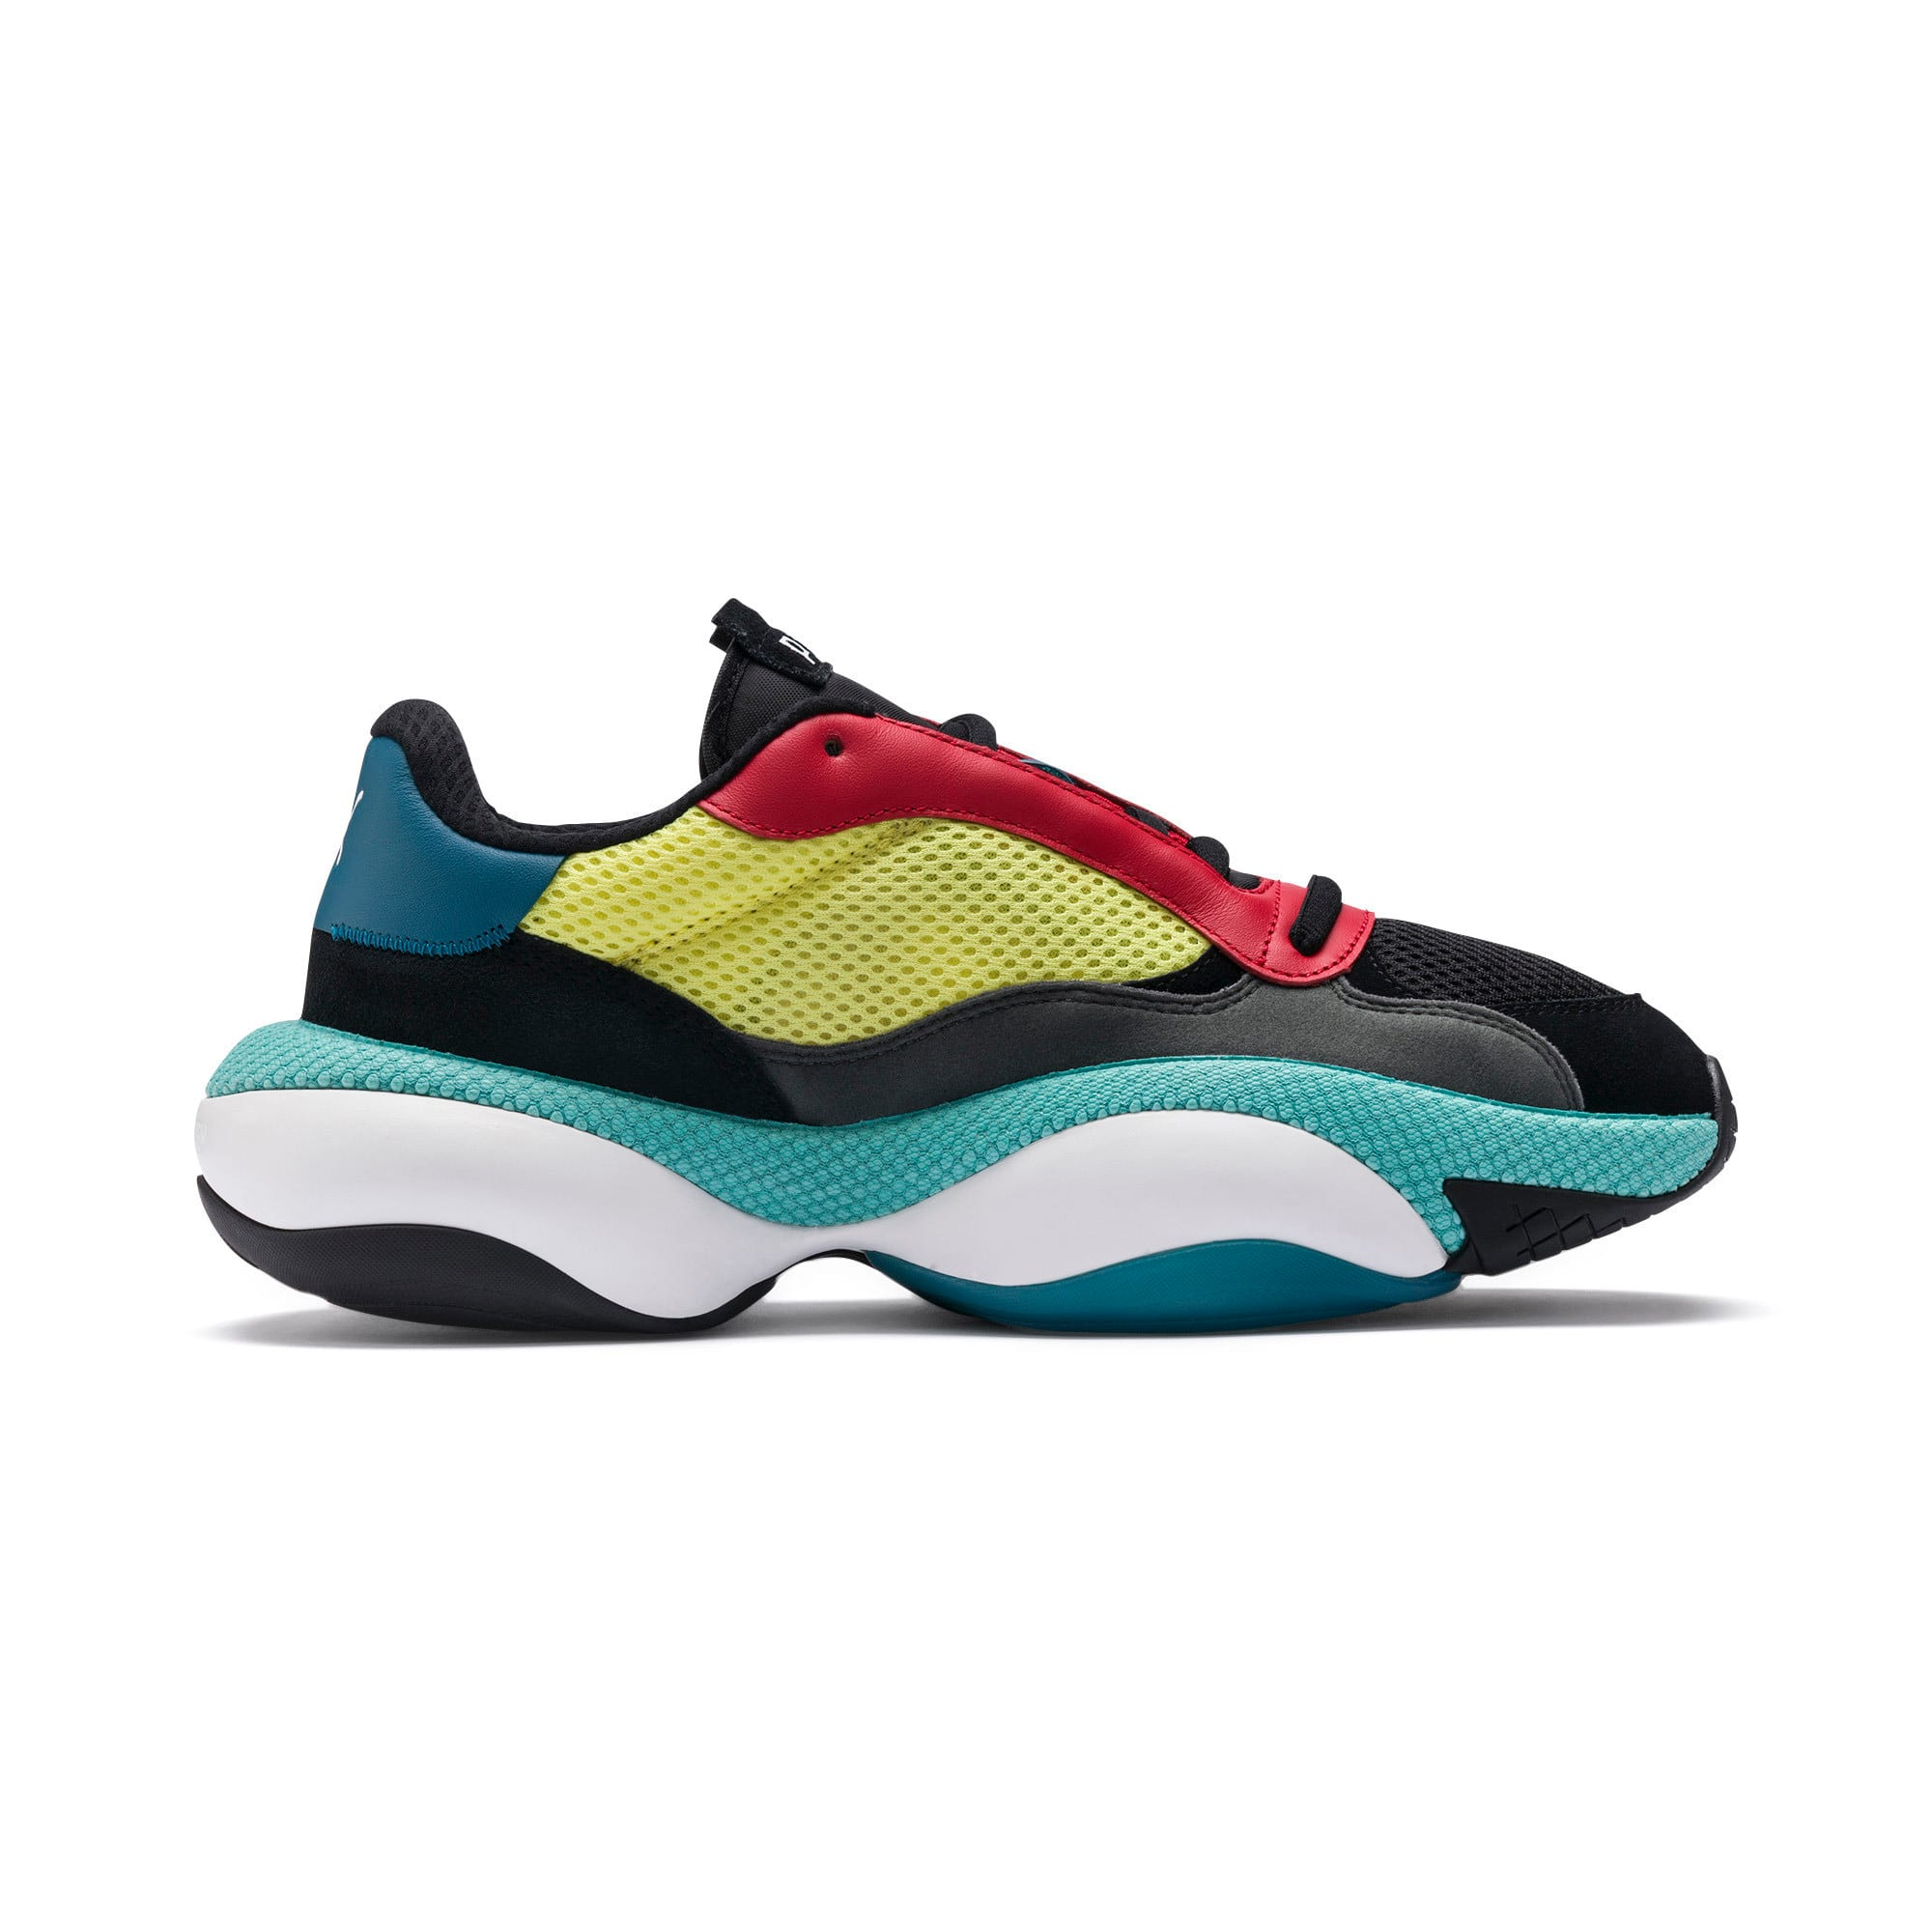 Thumbnail 5 of Alteration Kurve Sneakers, Puma Black-Limelight, medium